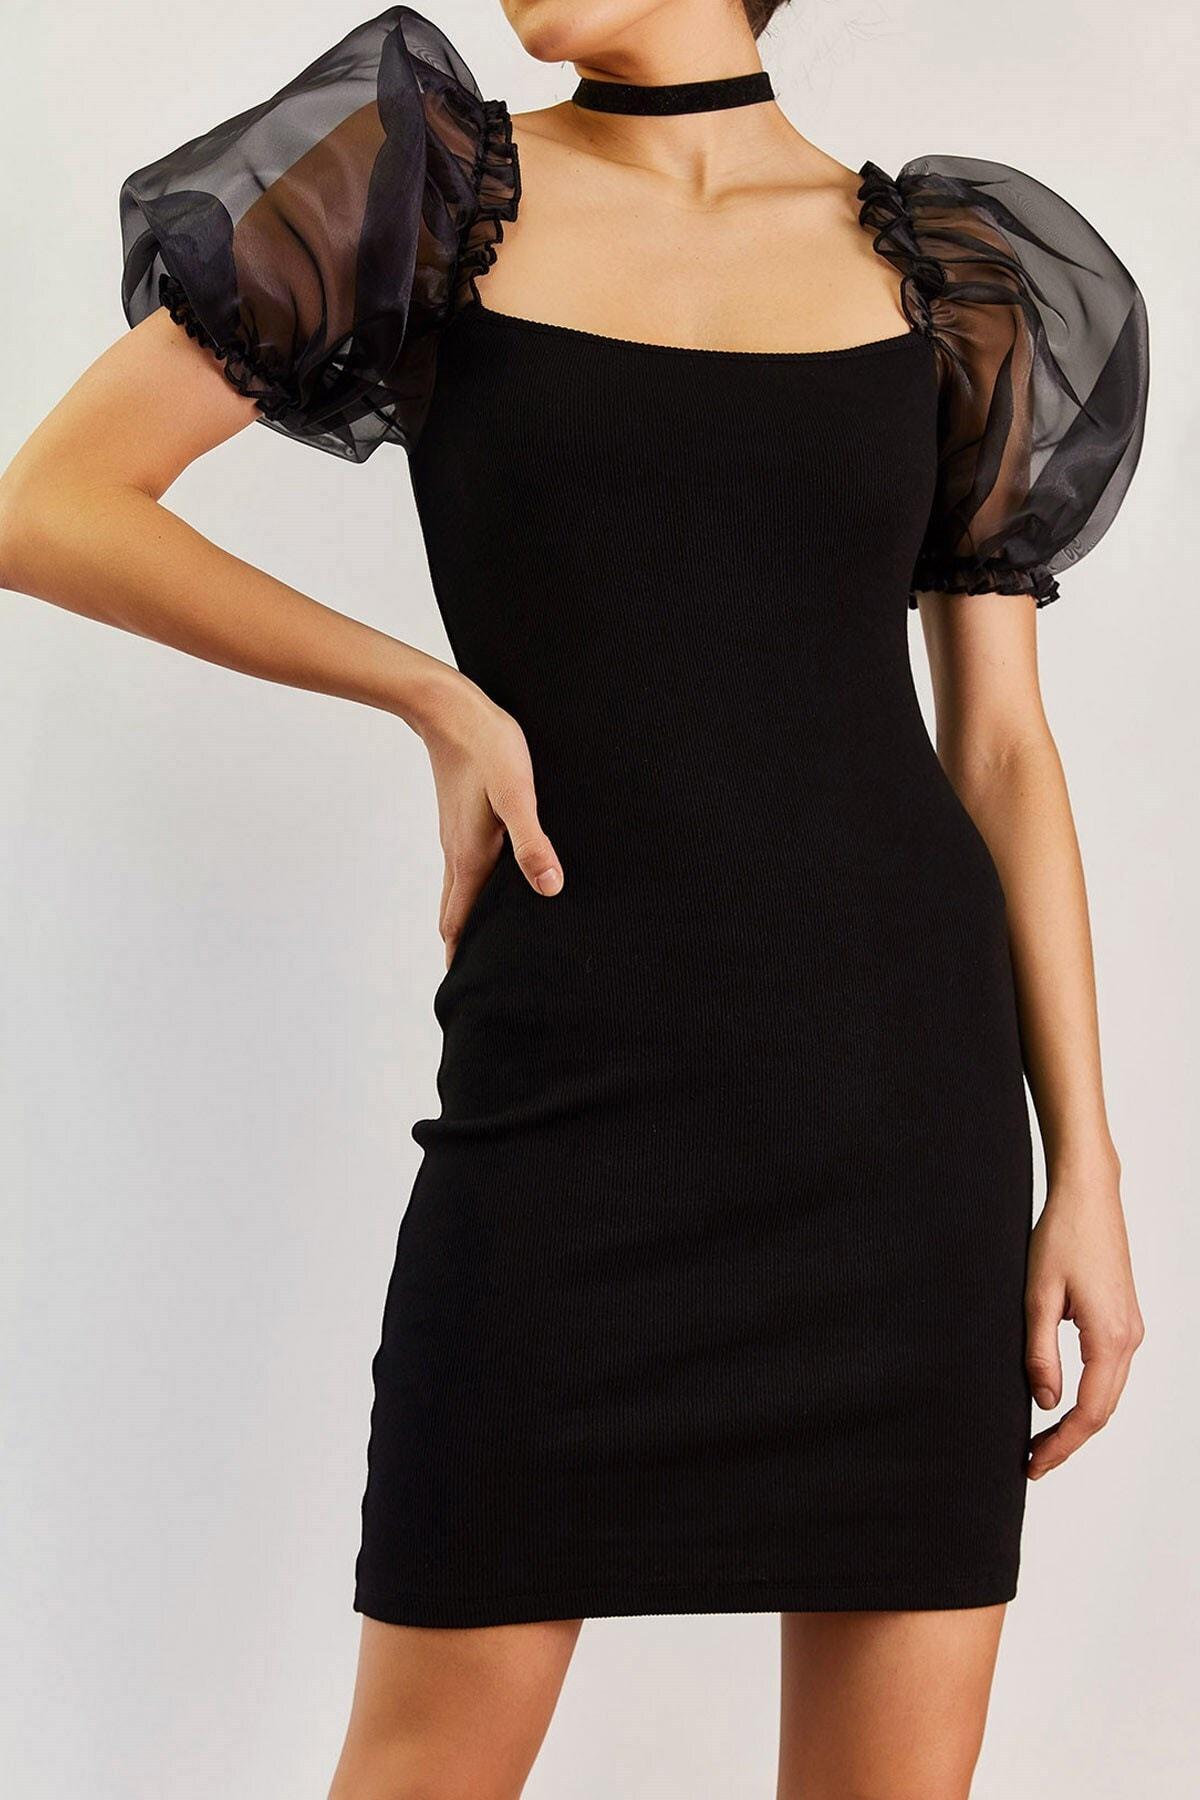 Boutiquen Kadın Siyah Organze Kısa Kollu Elbise 2210